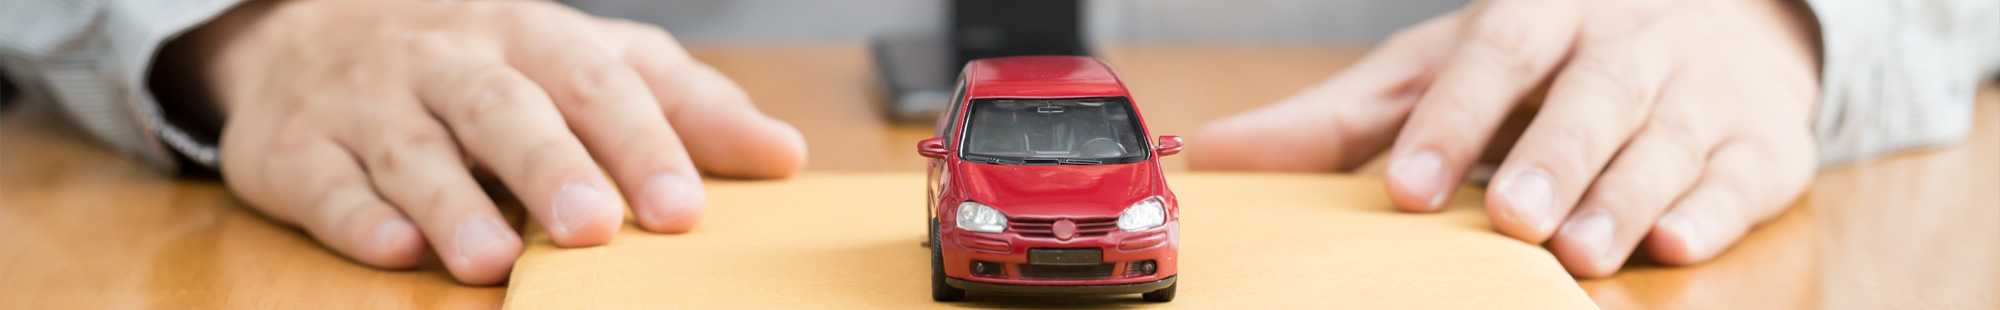 auto zabawkowe na stole